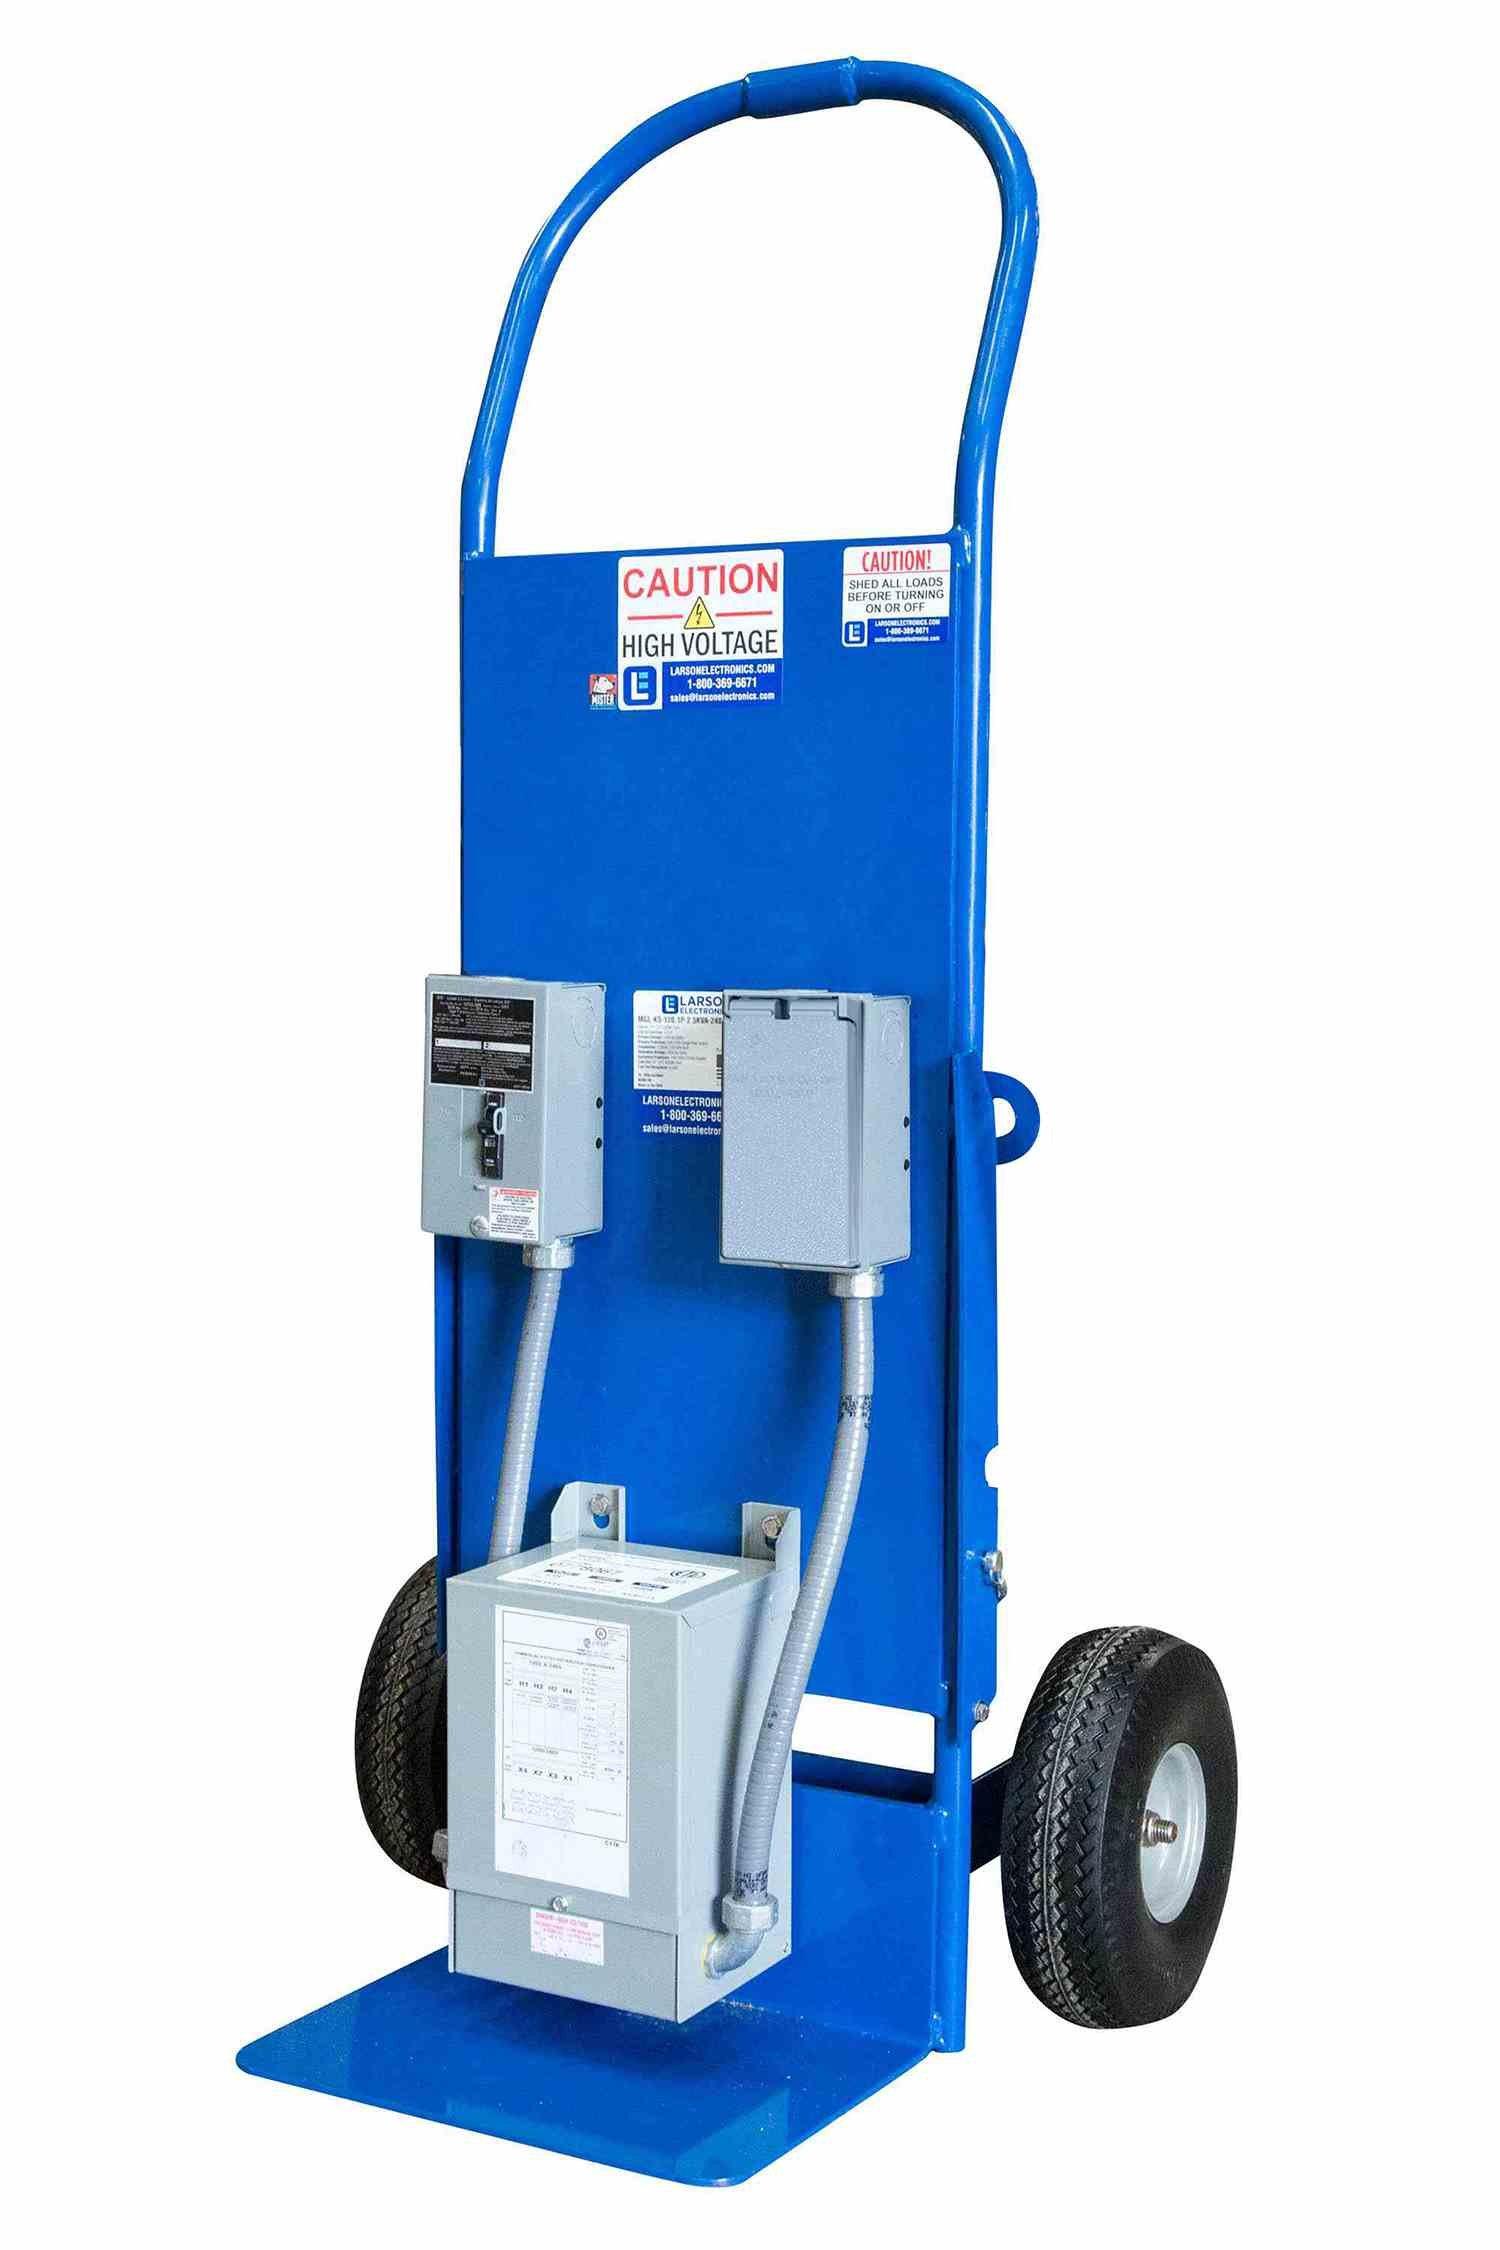 Mobile Power Distribution Center - 208V Delta Primary - 240V Delta Secondary - L15-30 - Dolly Cart